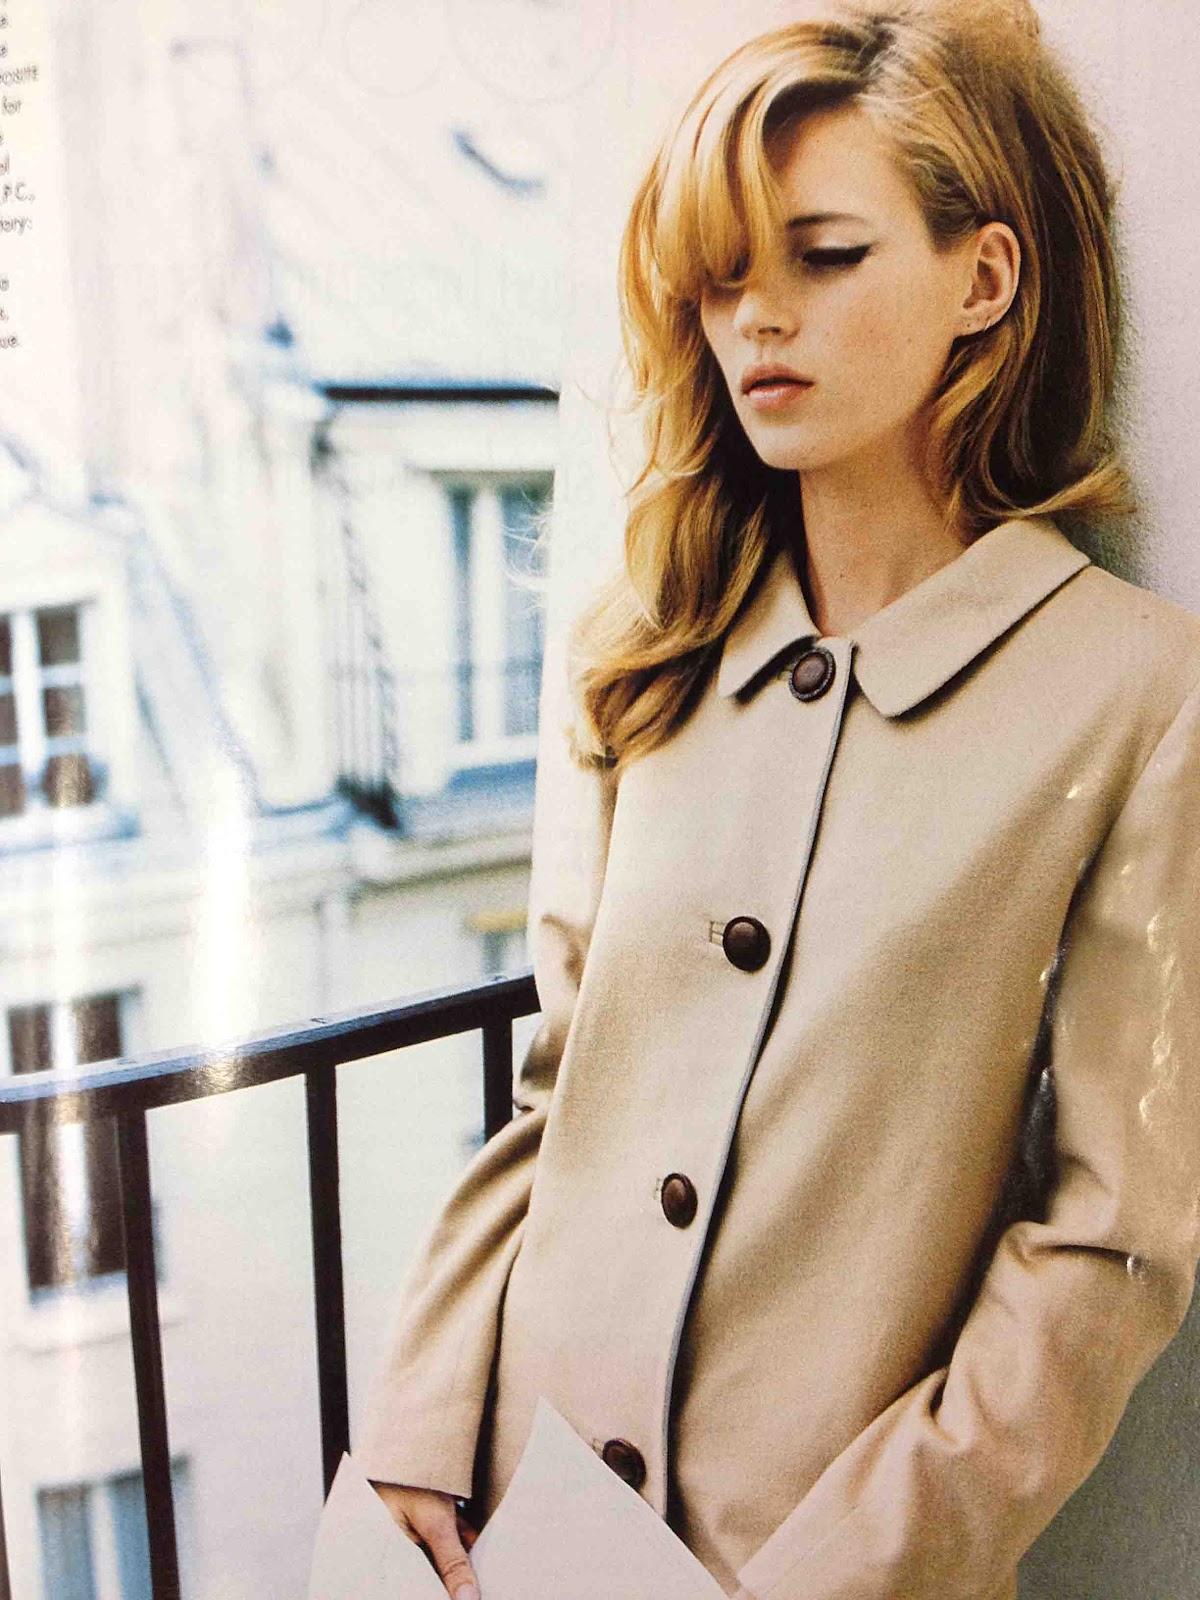 Jennifer Lopez Definitely Pregnant, Says Man With Eyes recommend